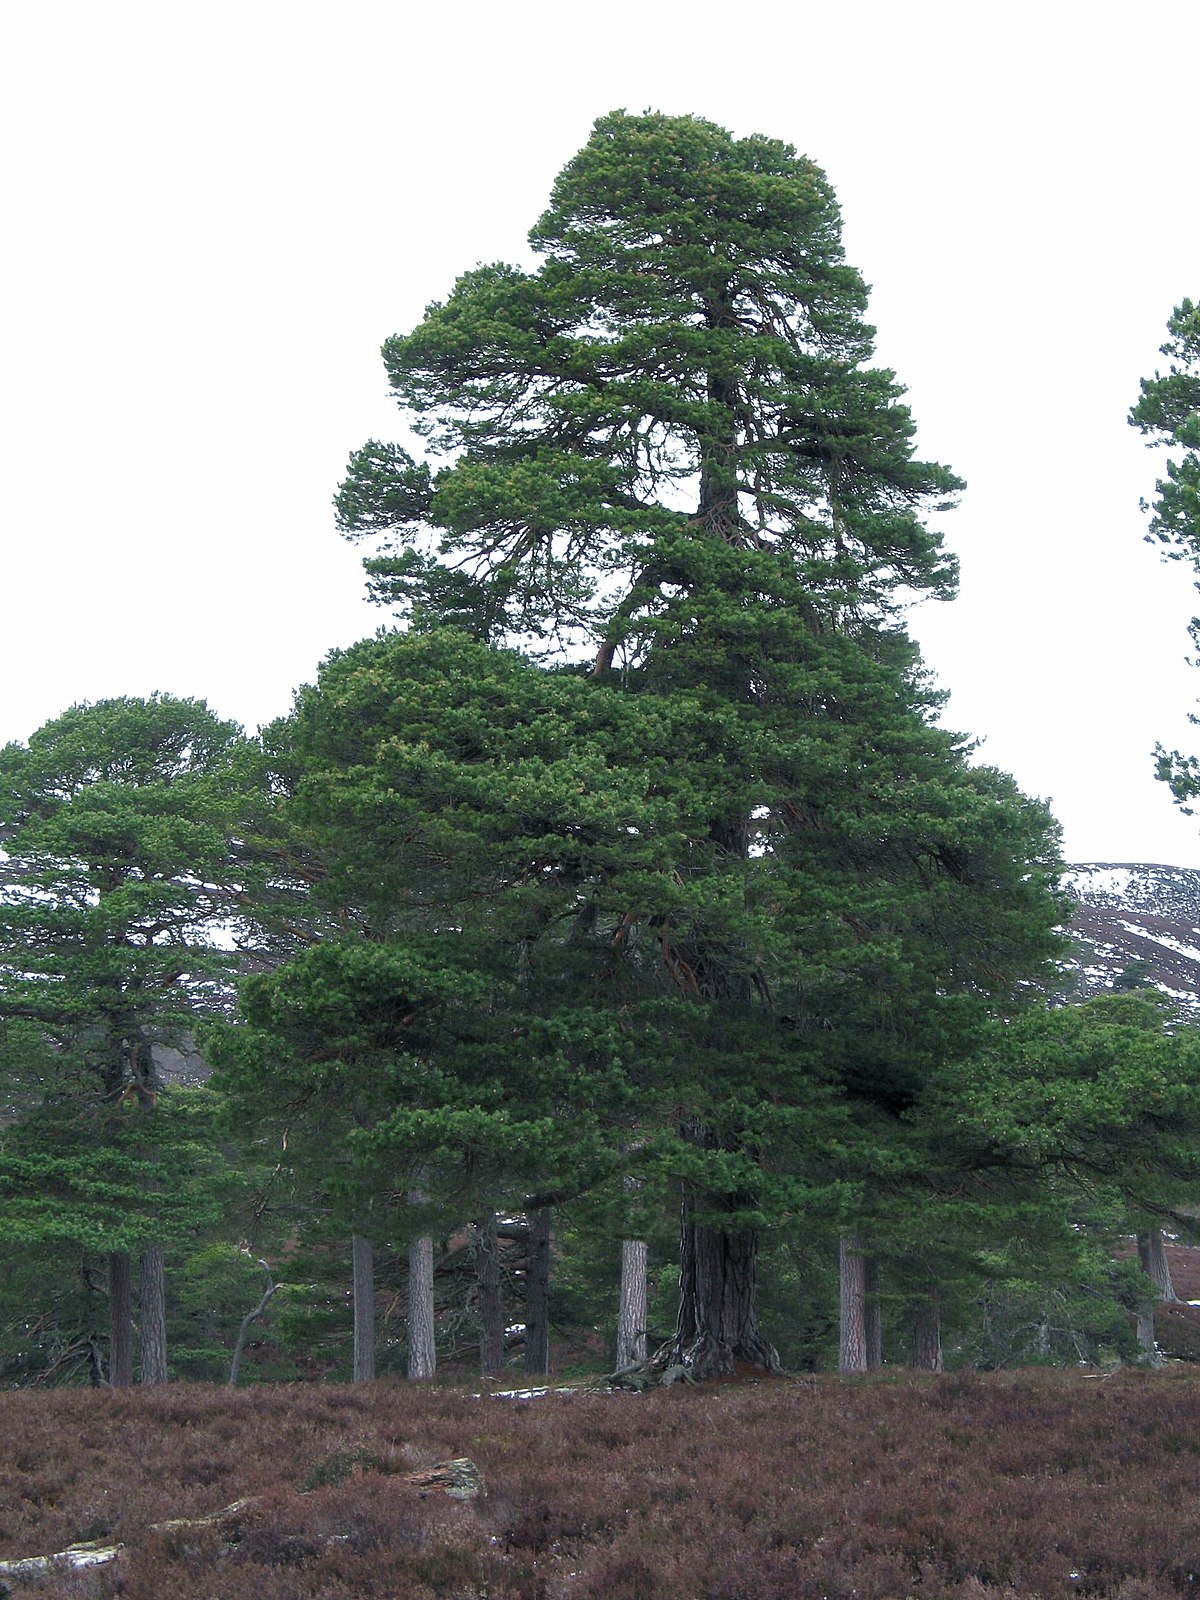 Pinus sylvestris wikipedia for Tipos de pinos para jardin fotos